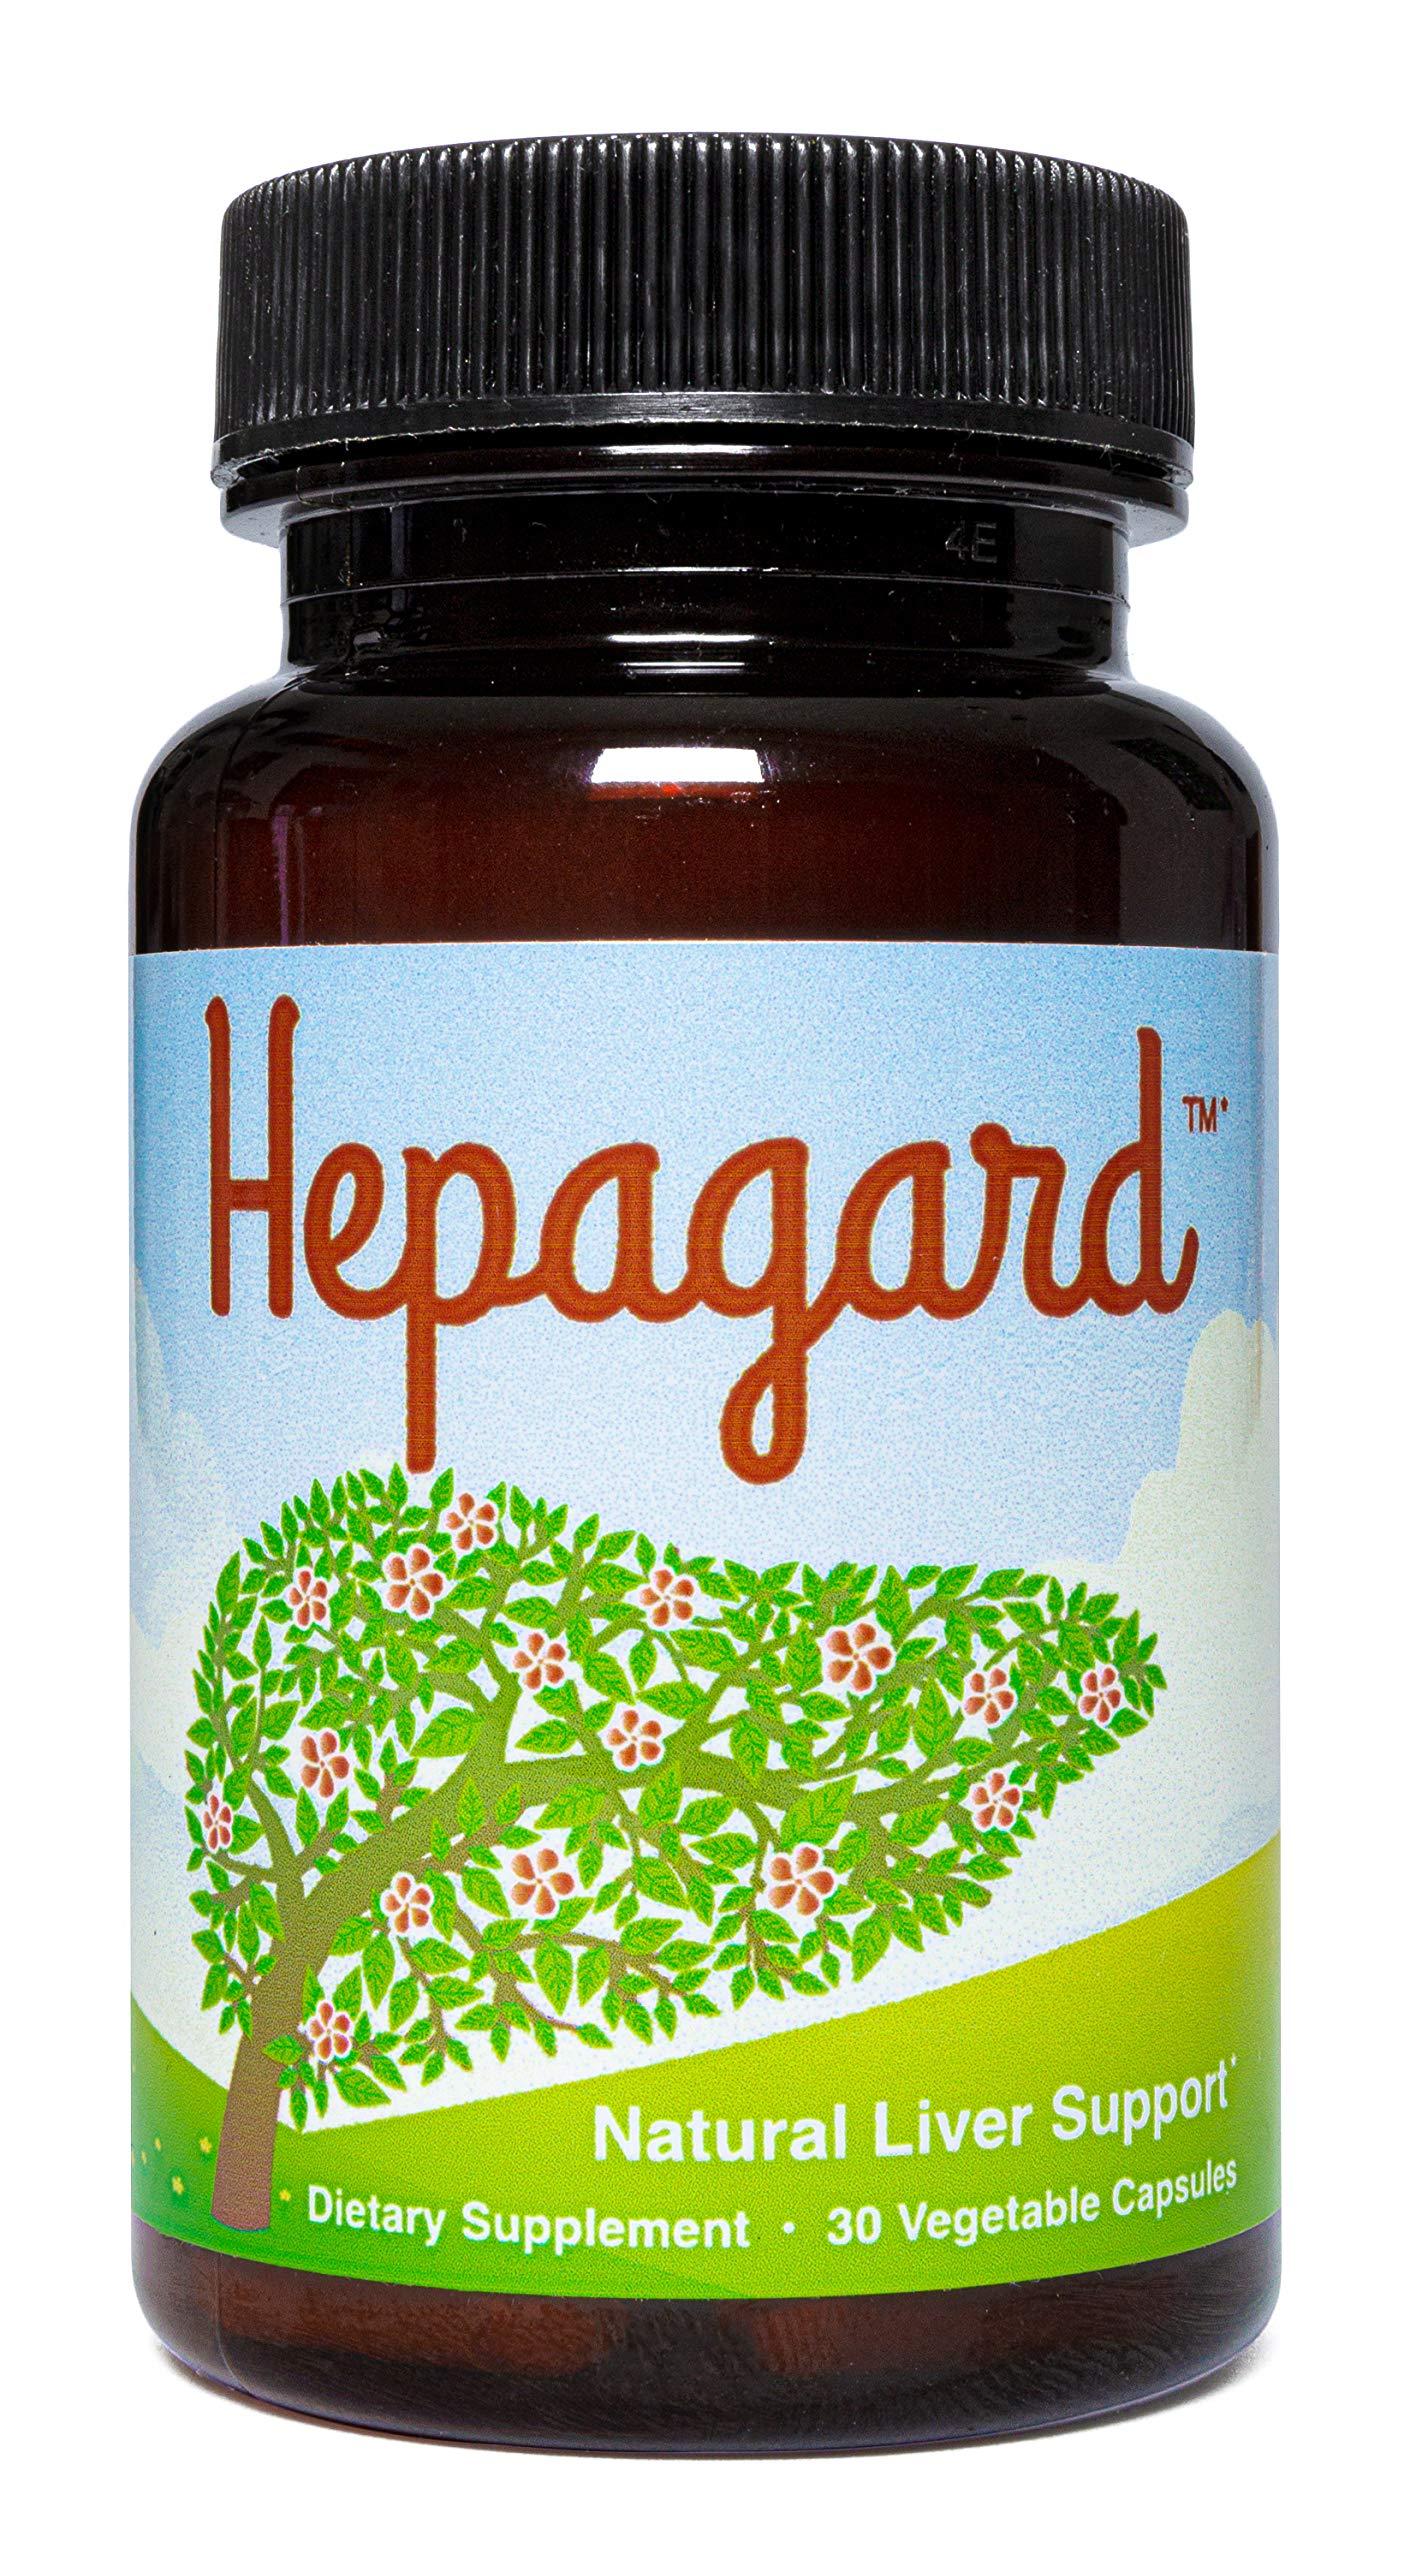 Hepagard - Natural Liver Support Supplement - Non-GMO, Gluten-Free